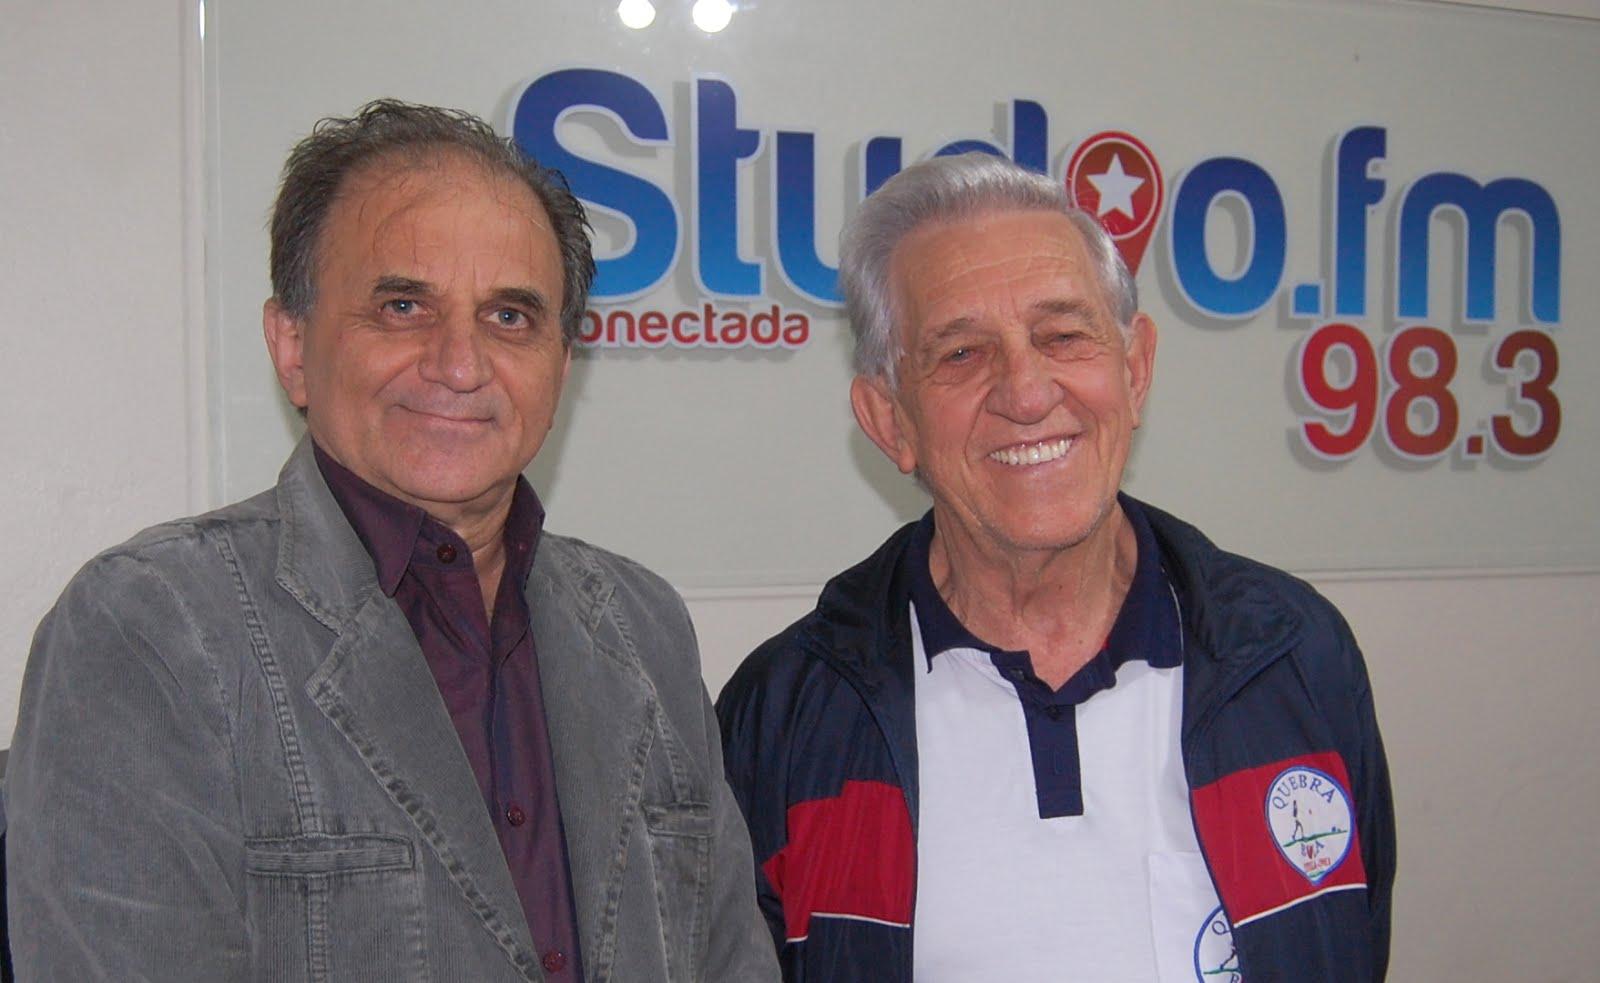 Airton Engster dos Santos e Hélio Musskopf